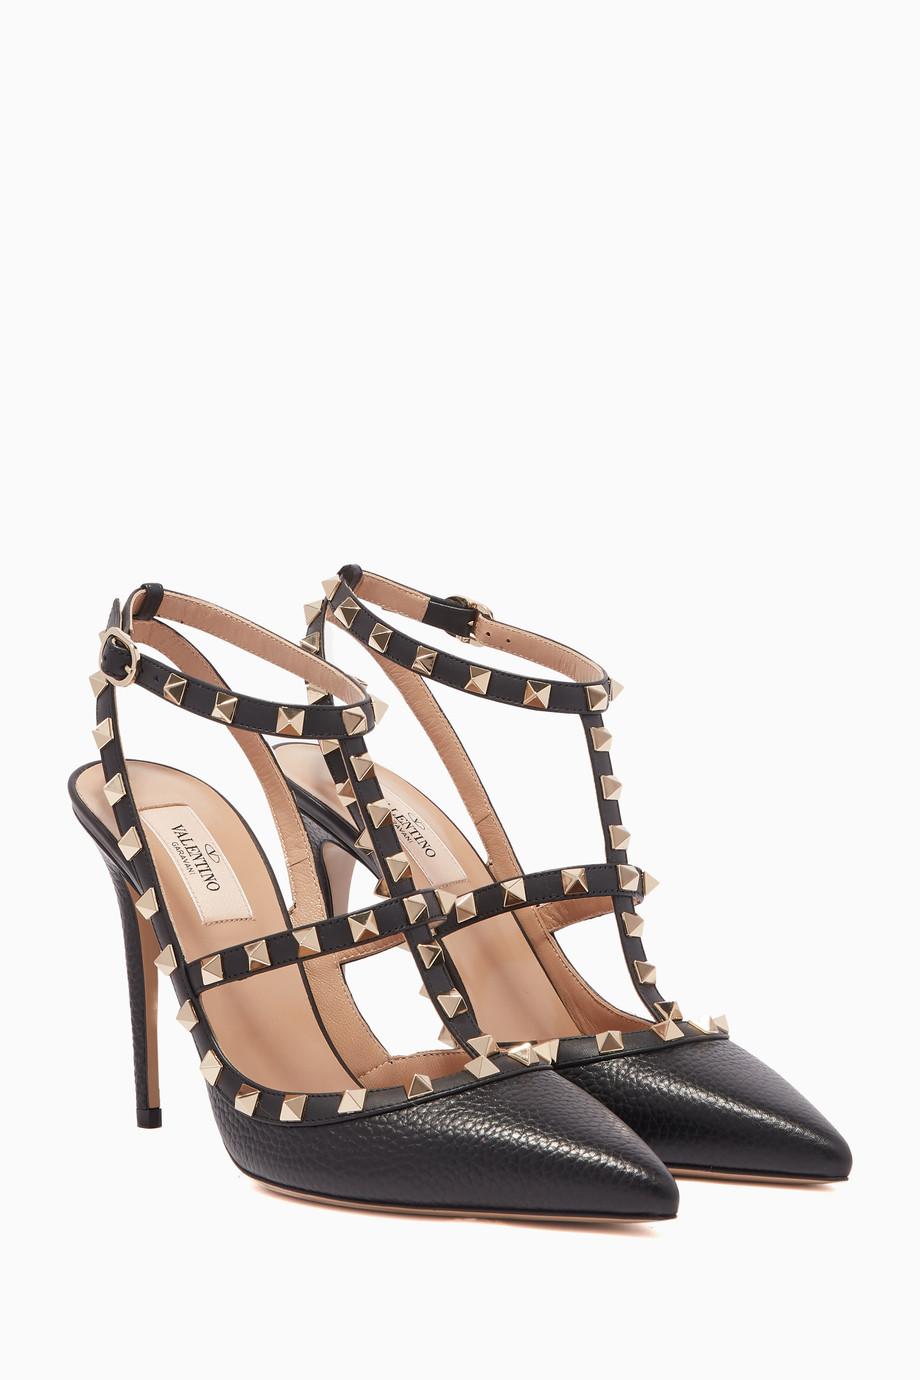 5042a54678c Shop Valentino Black Black T-Bar Leather Rockstud Pumps for Women ...